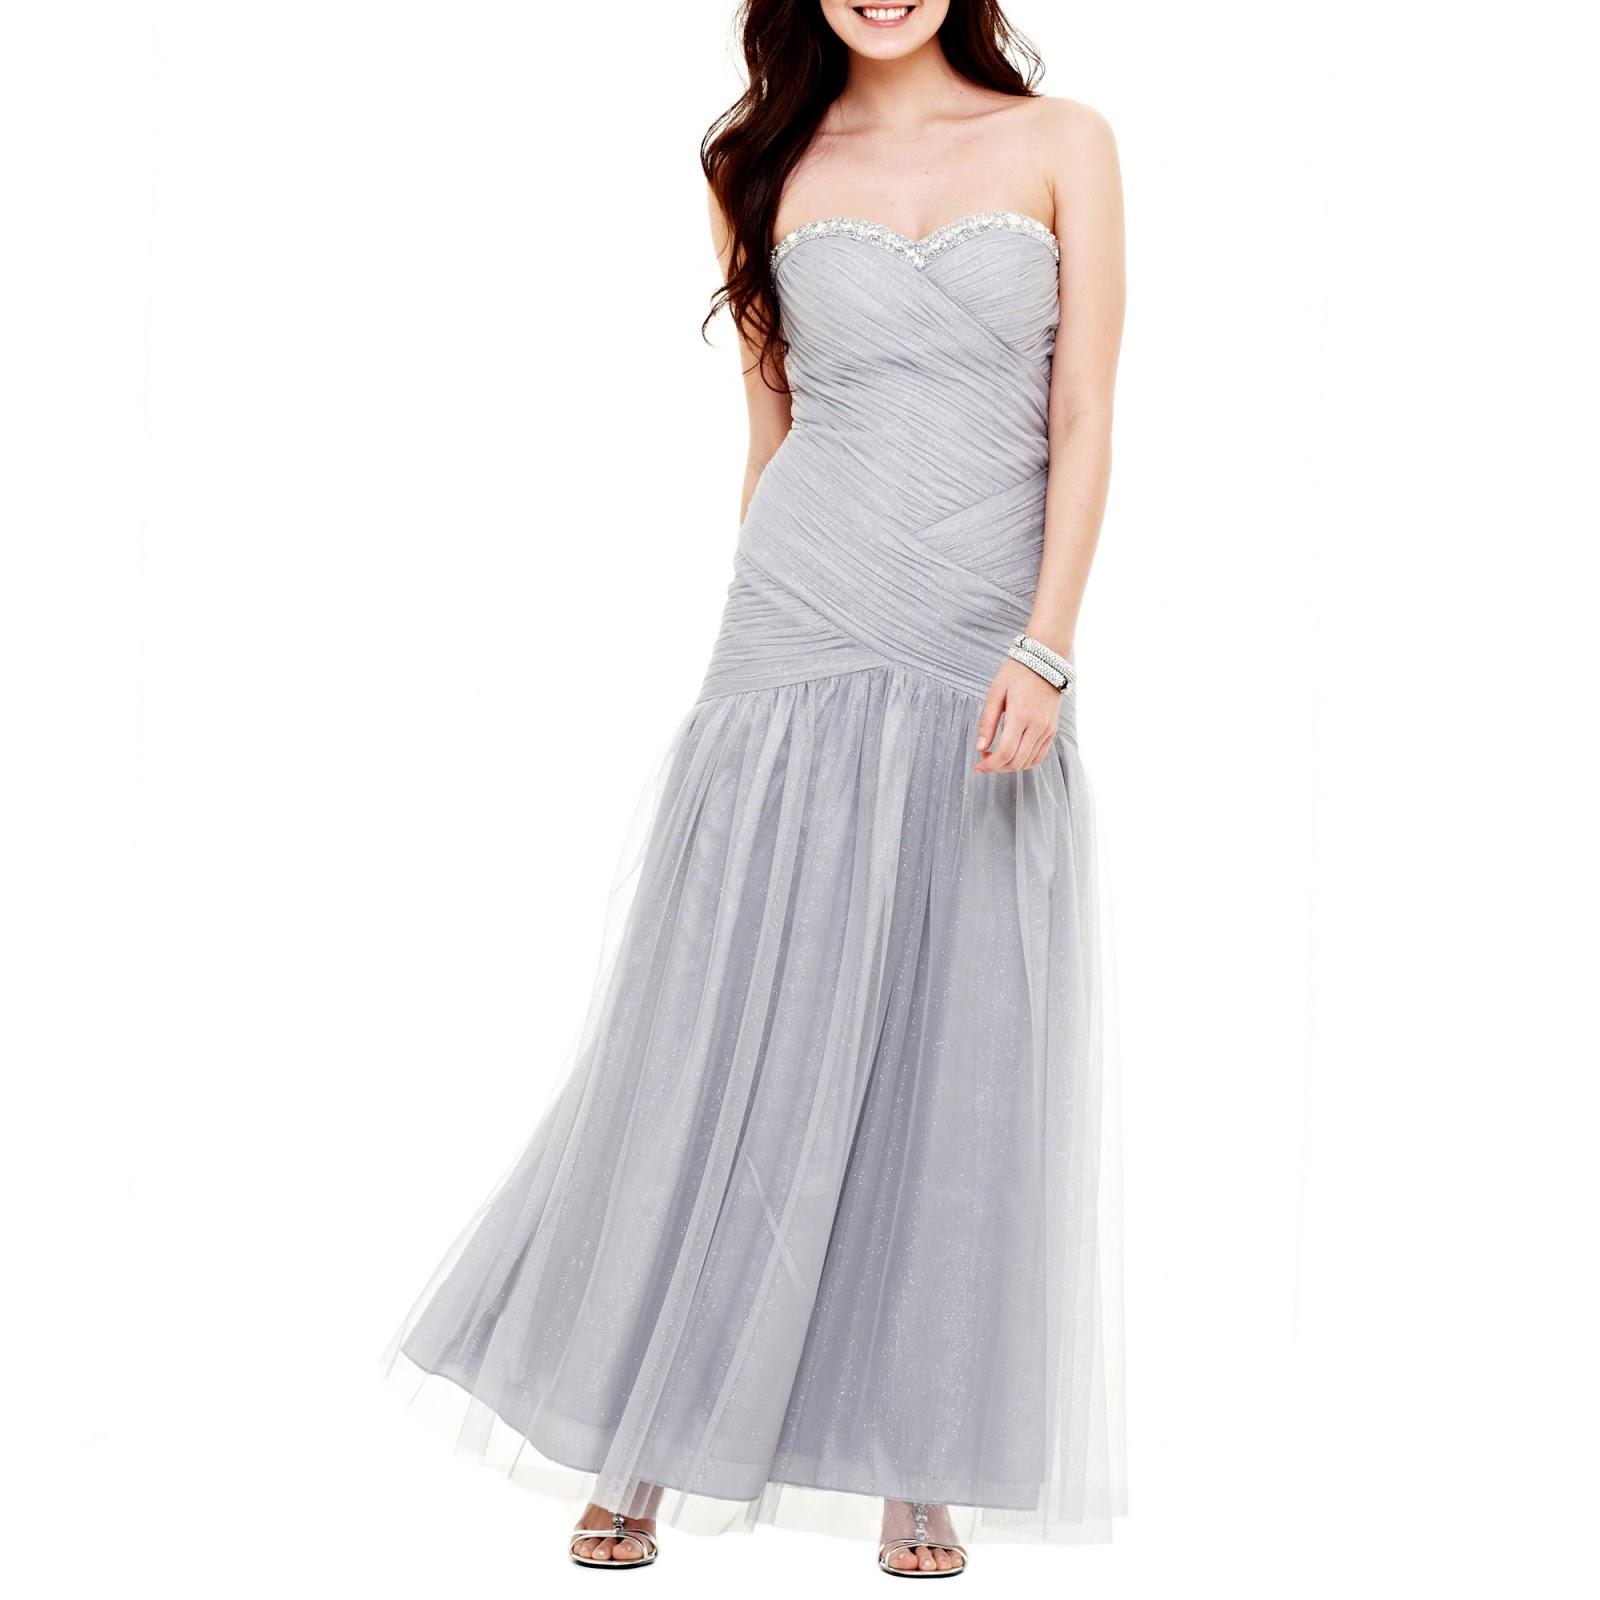 $200 wedding dresses photo - 1